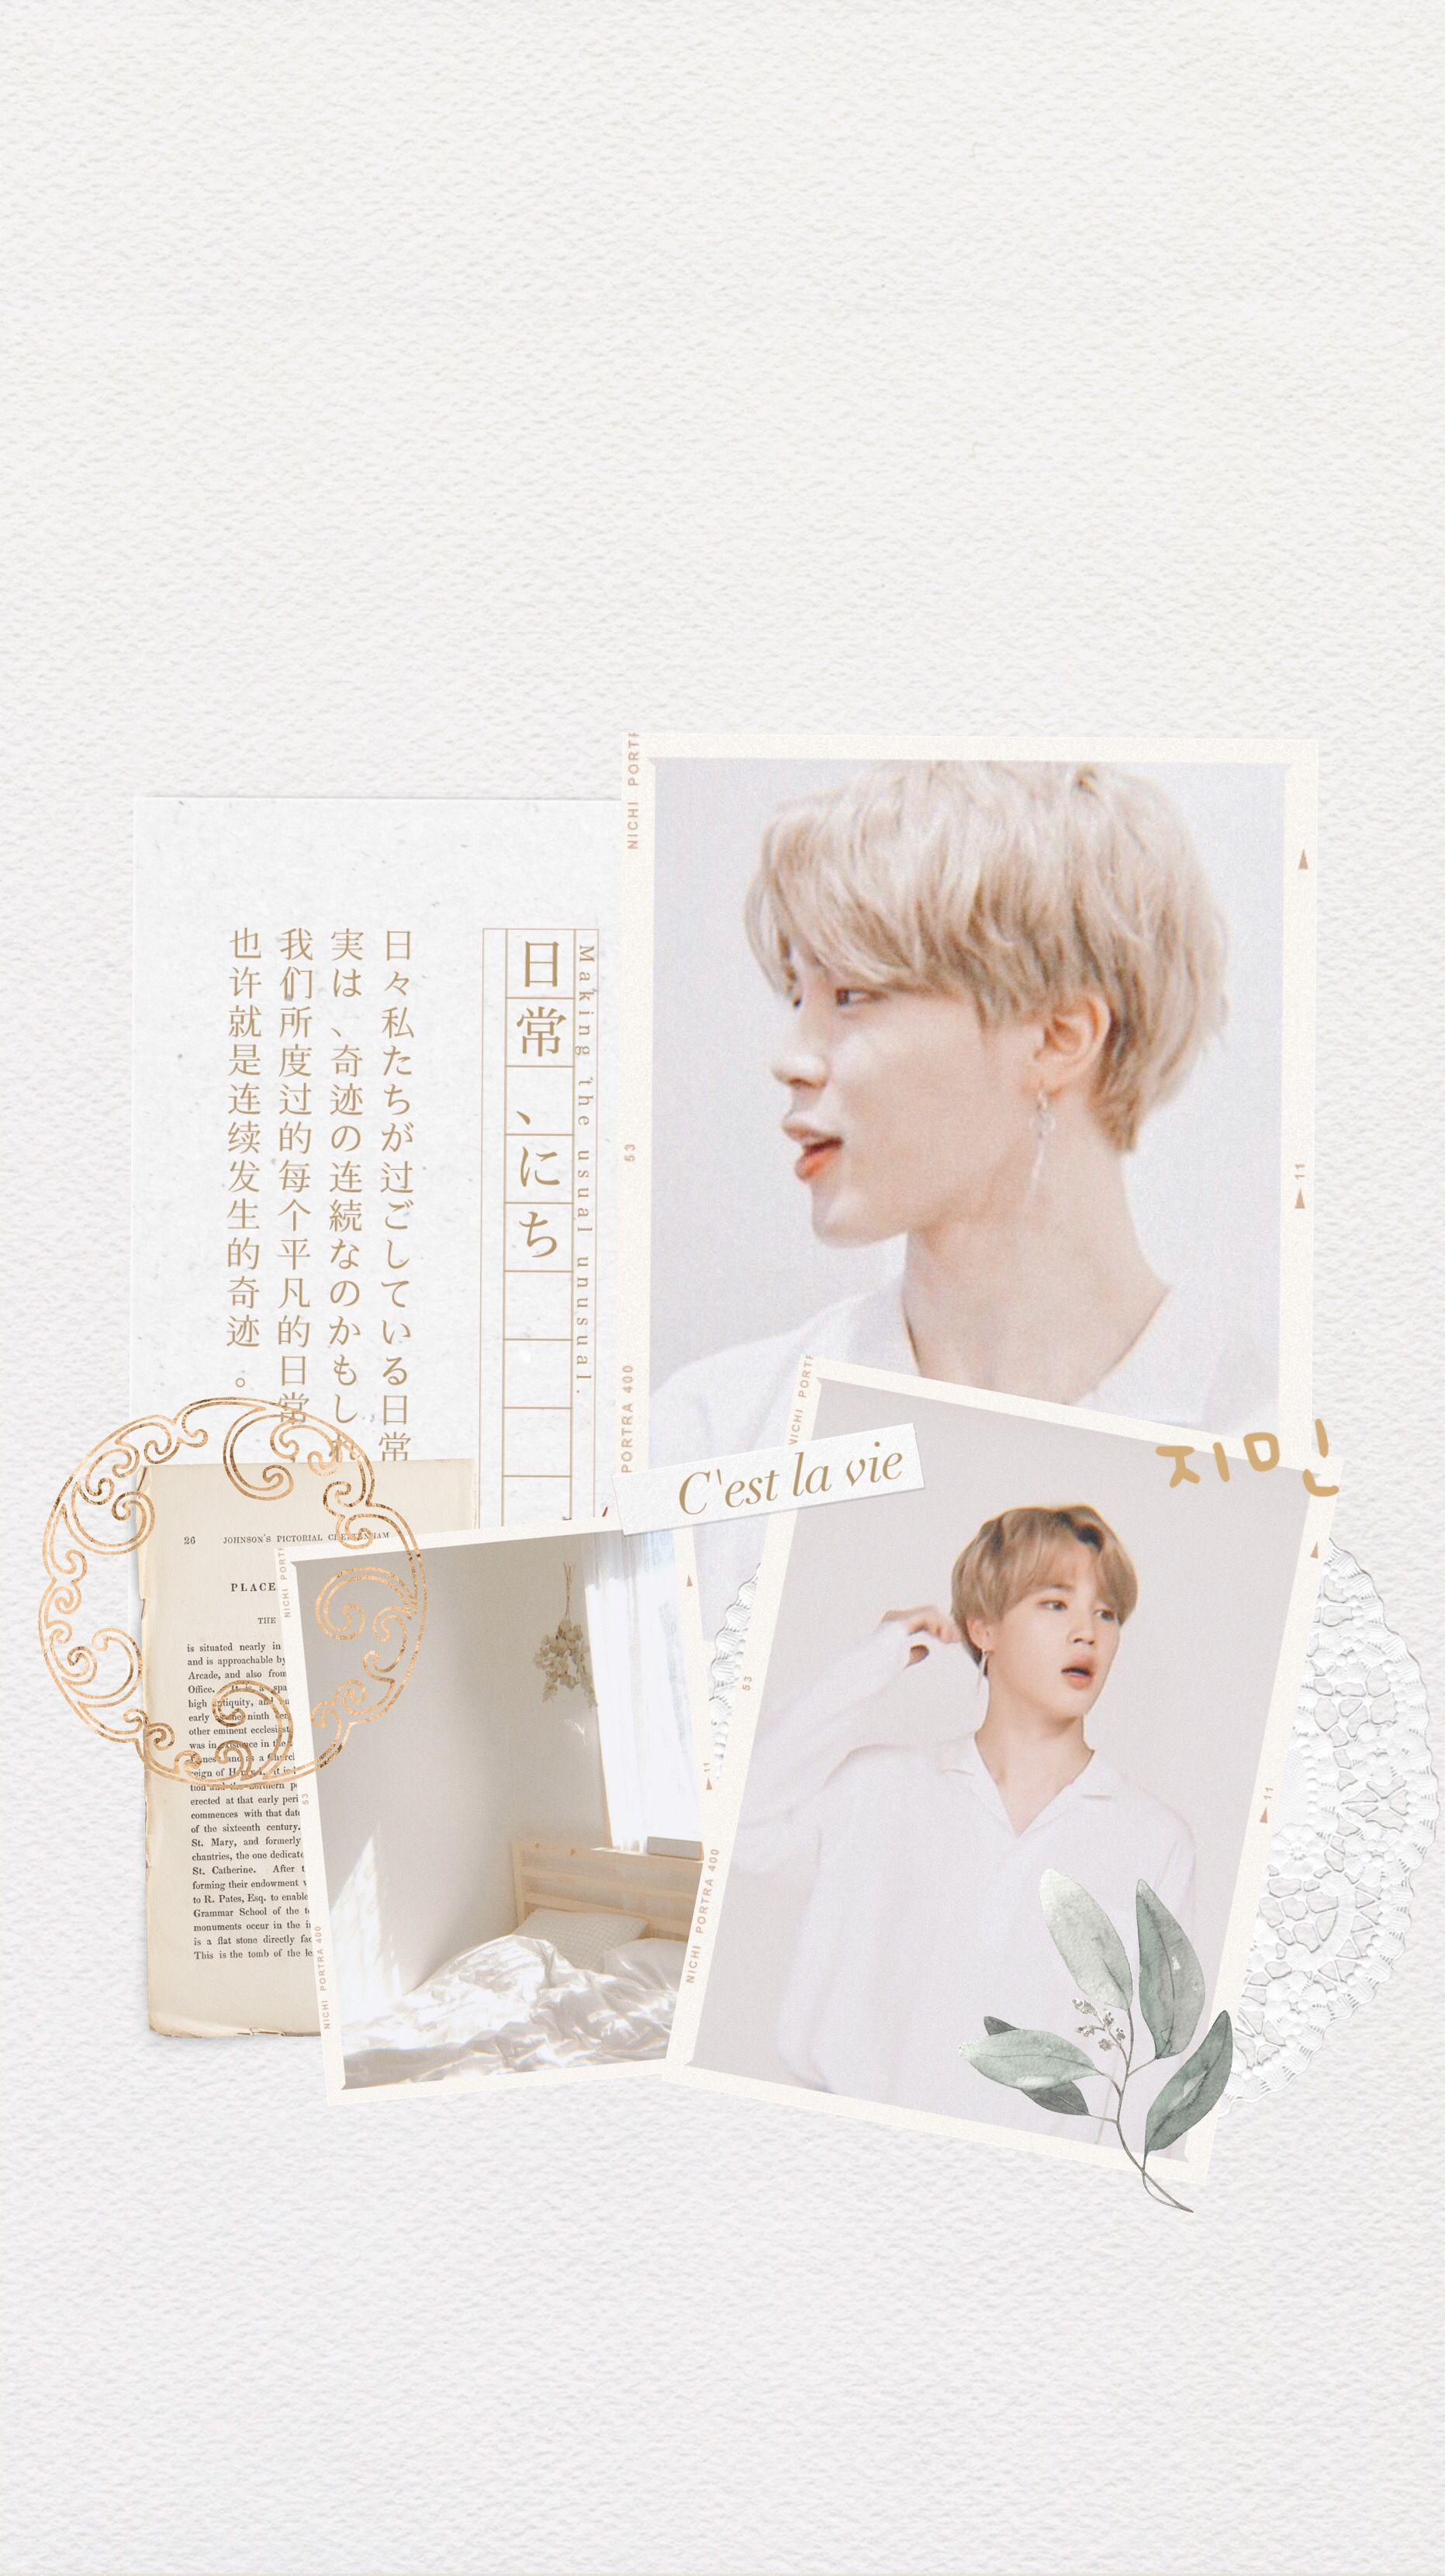 Kpop White Aesthetic Wallpaper Novocom Top